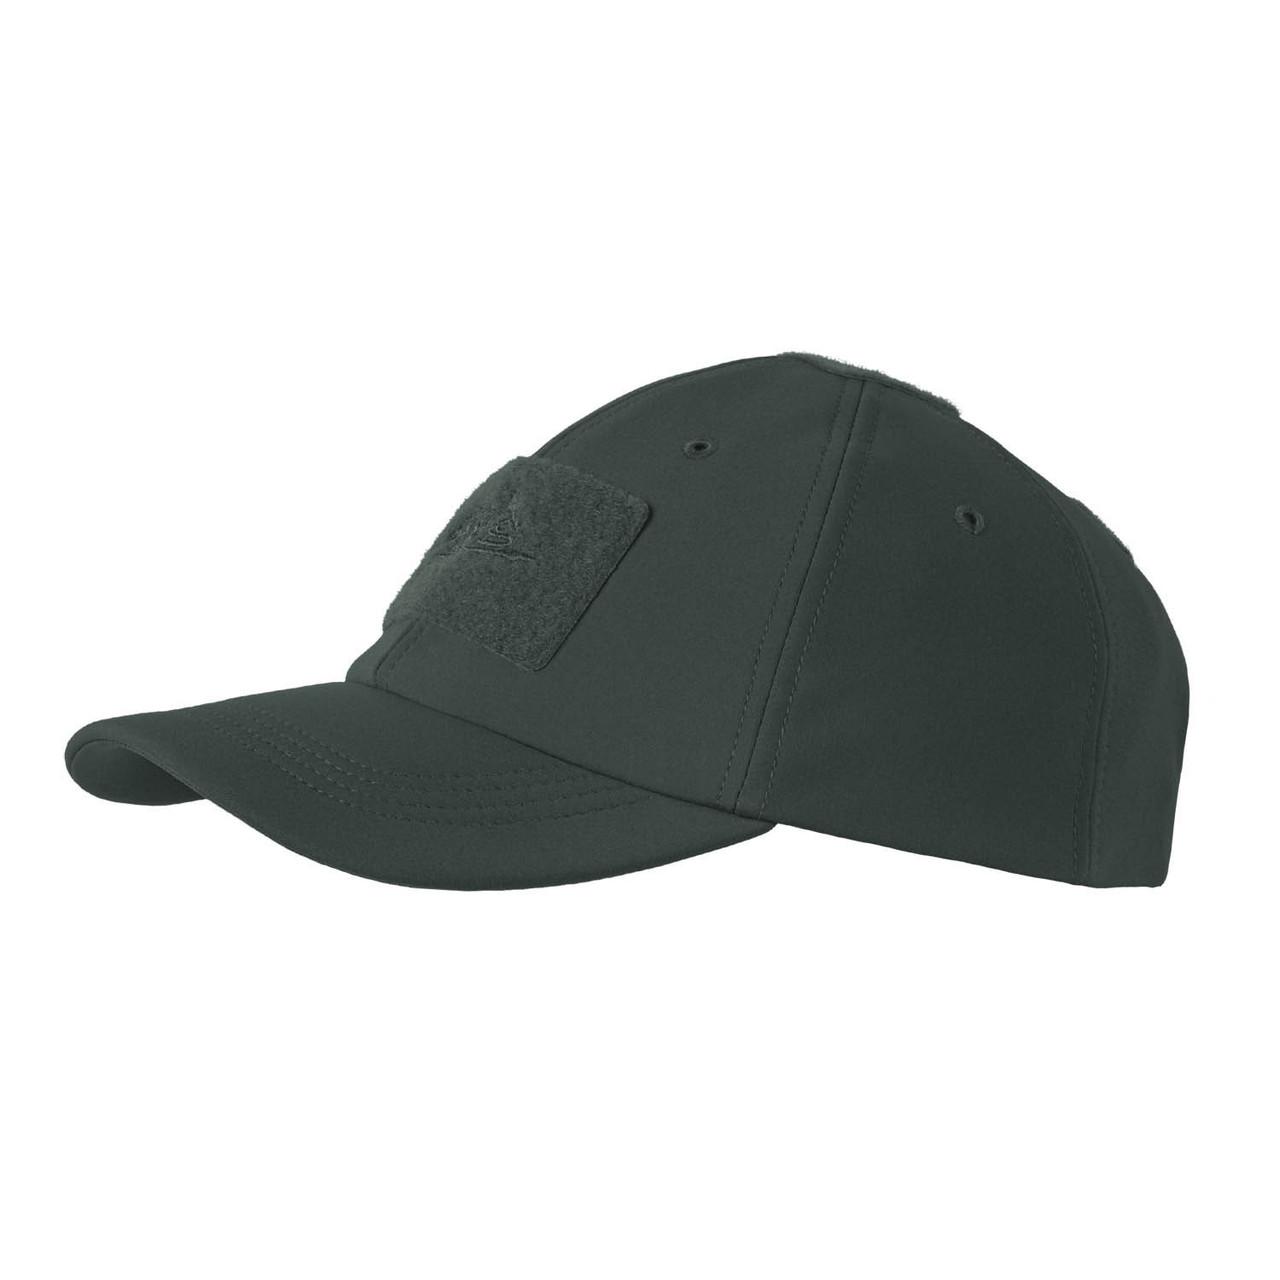 Тактическая бейсболка зимняя Helikon-Tex® Tactical Baseball Winter Cap - Jungle Green